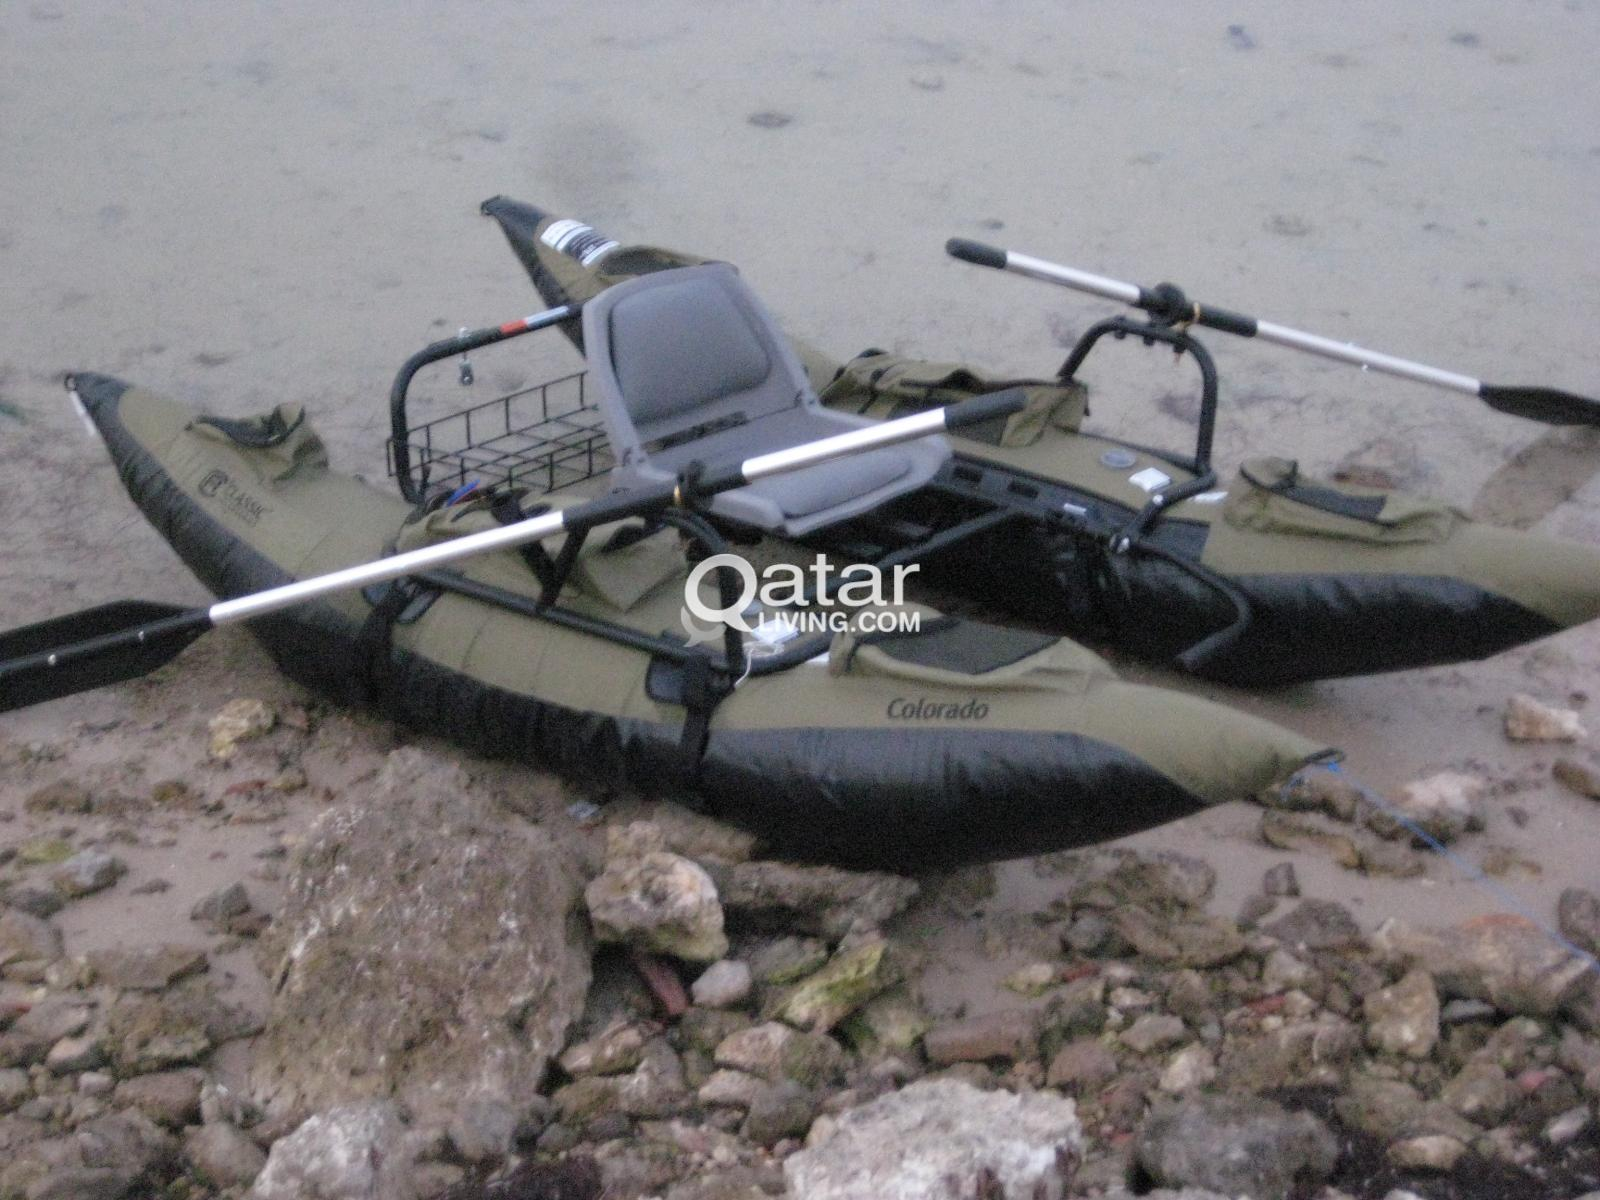 Inflatable Pontoon Boat + Minn Kota® Endura™ C2 55 Trolling Motor